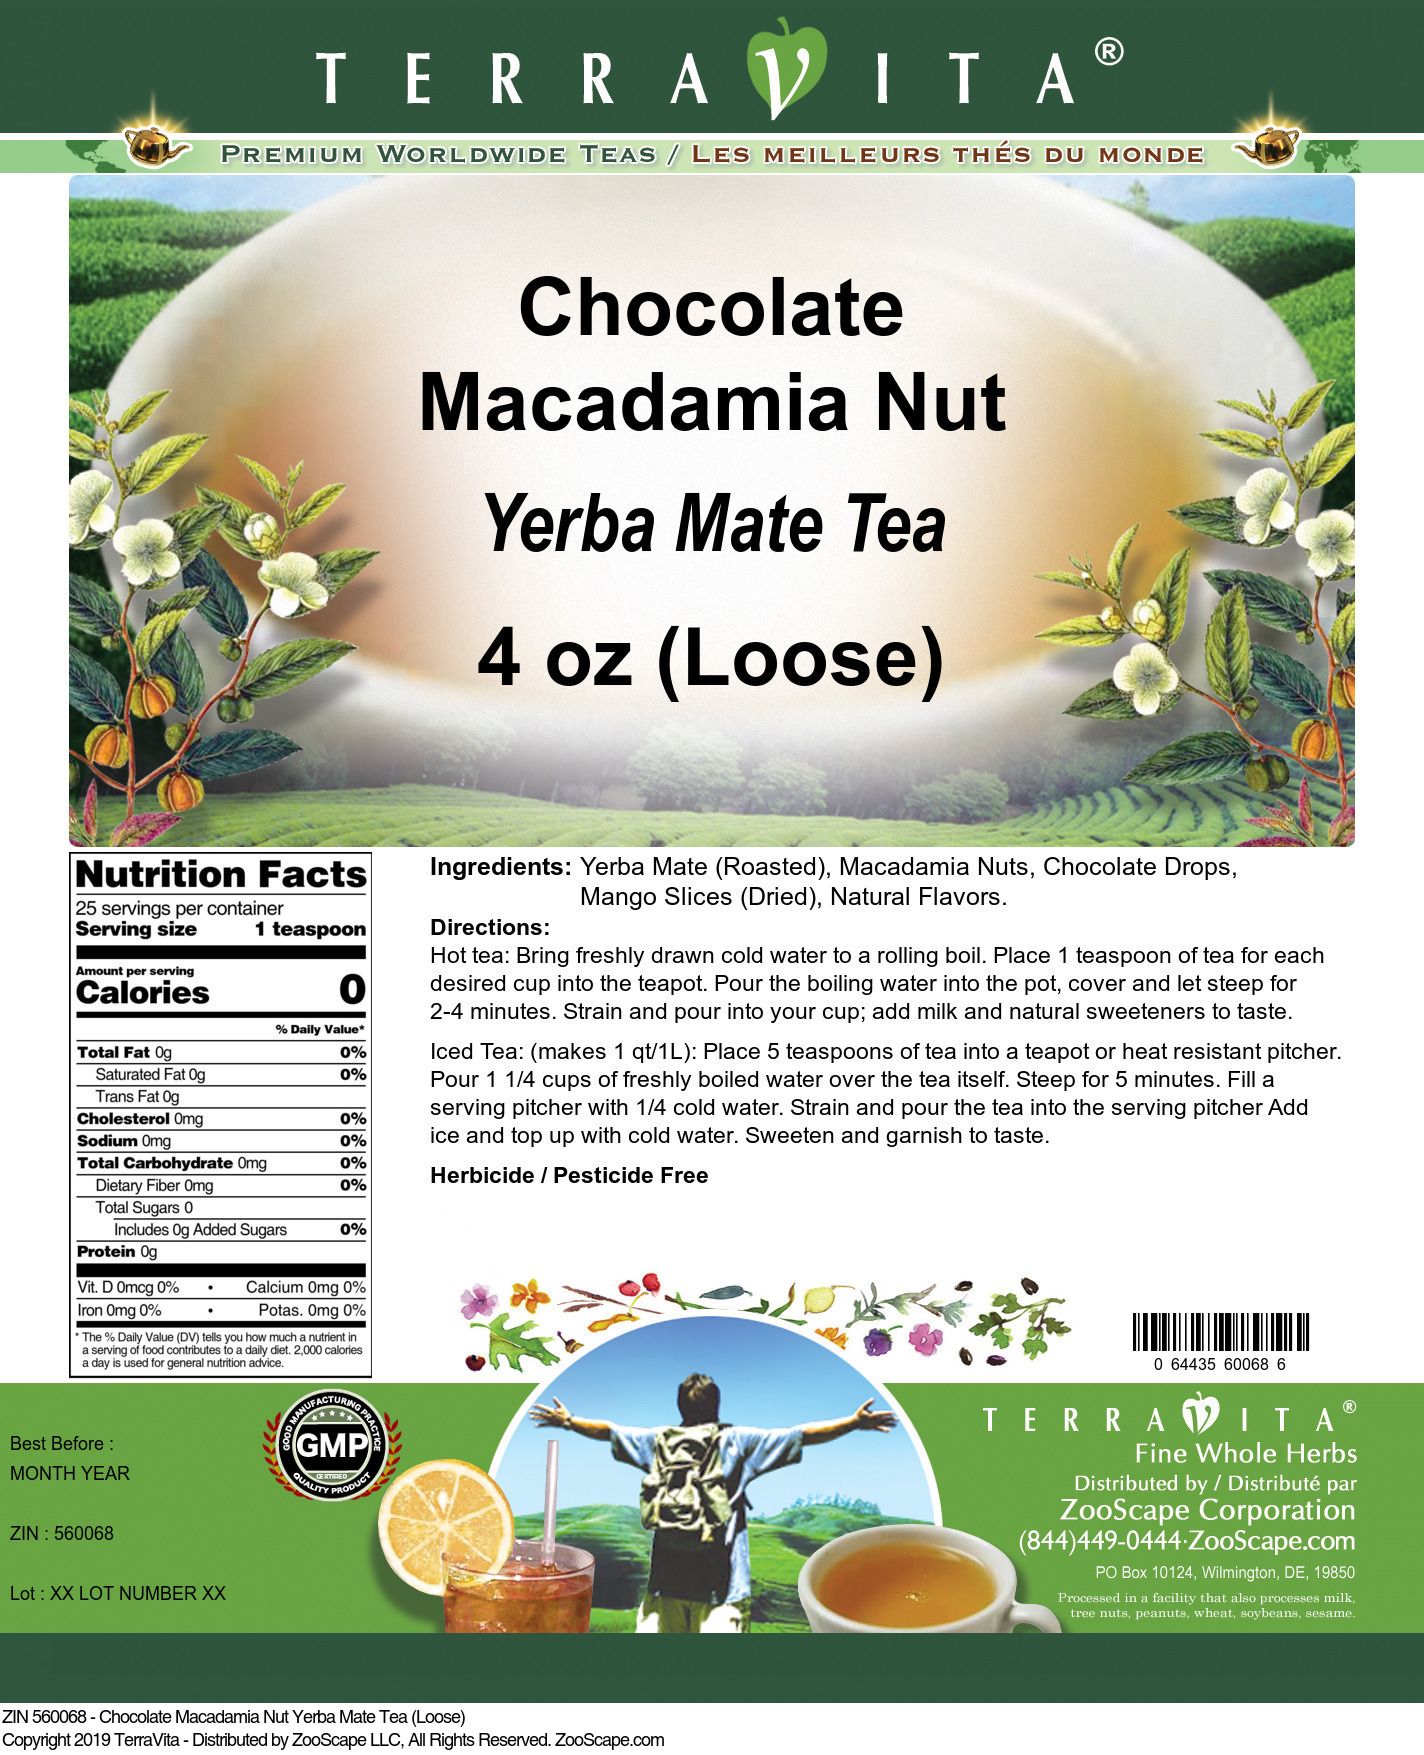 Chocolate Macadamia Nut Yerba Mate Tea (Loose)